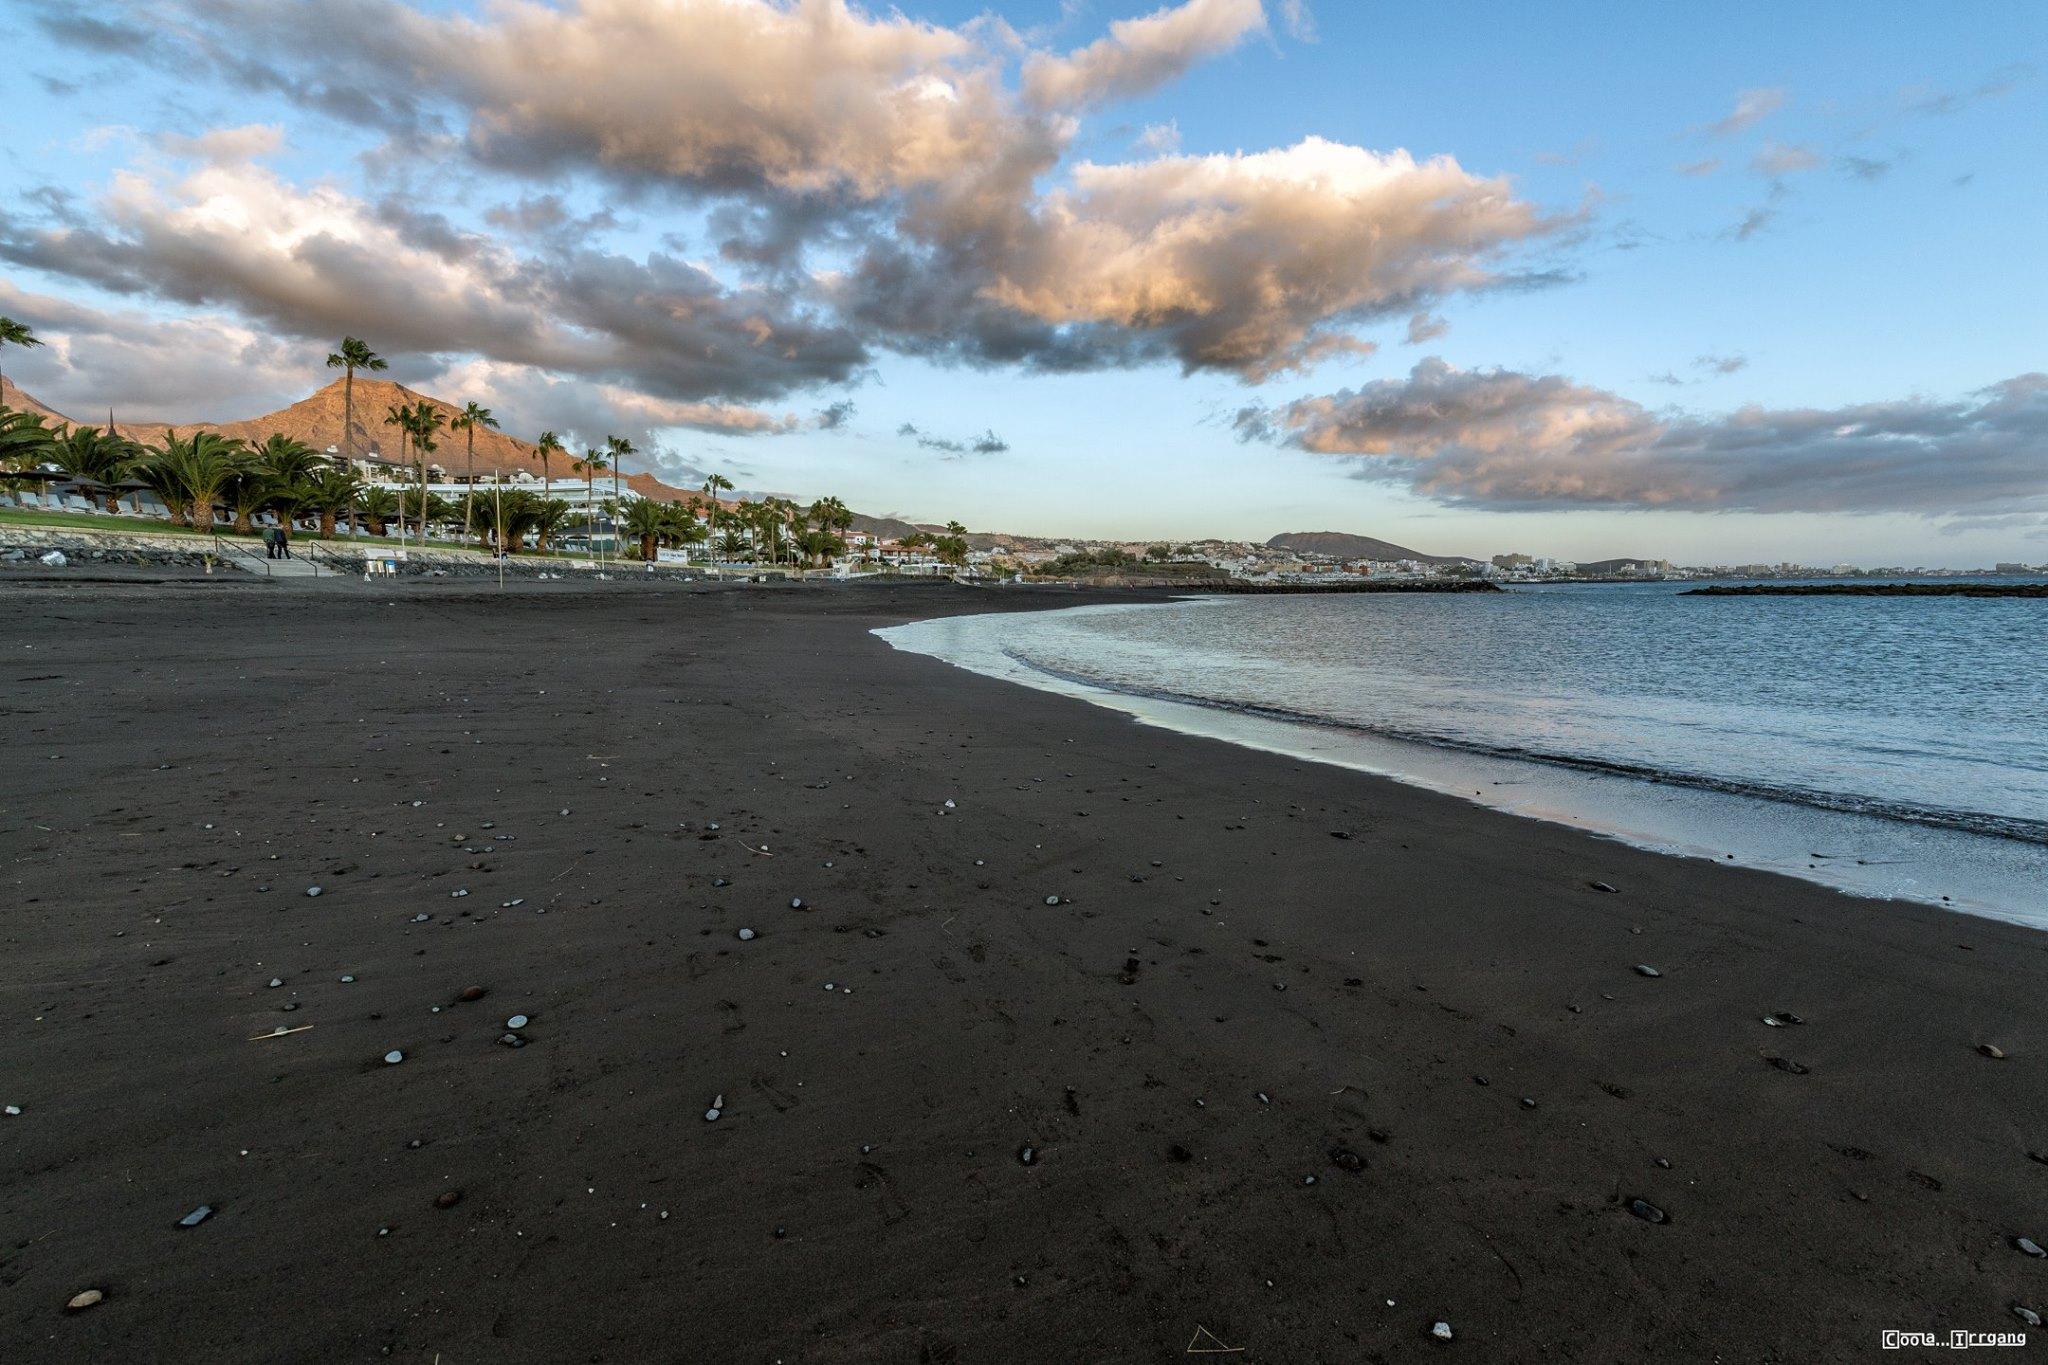 Playa El Beril